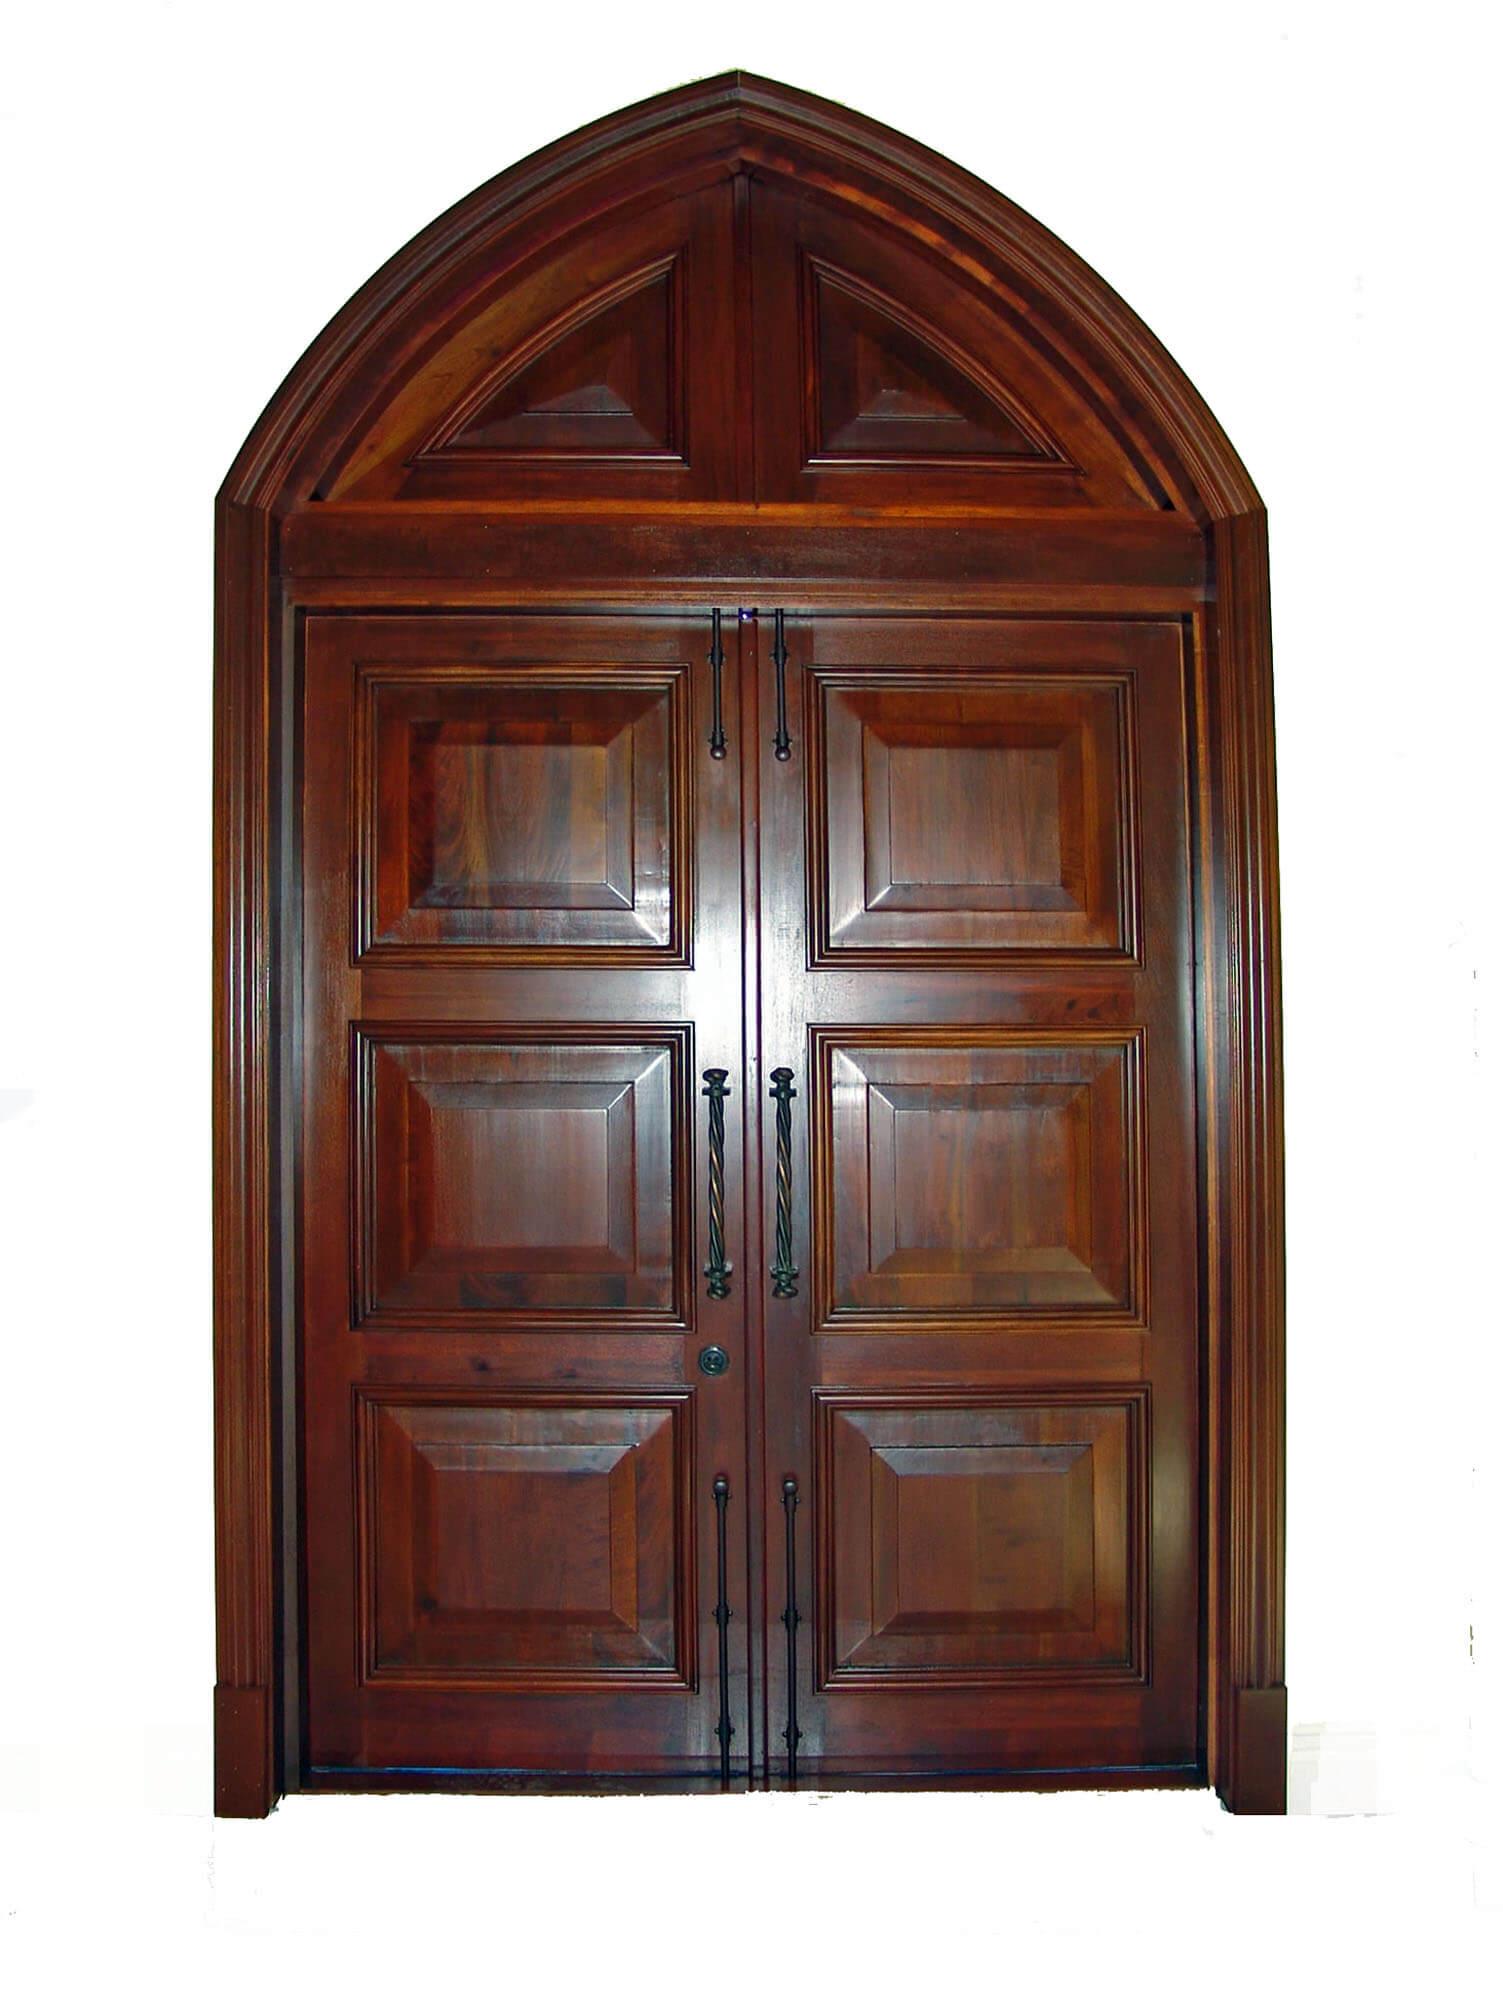 ST. PETE BEACH. MAHOGANY ENTRANCE DOORS.